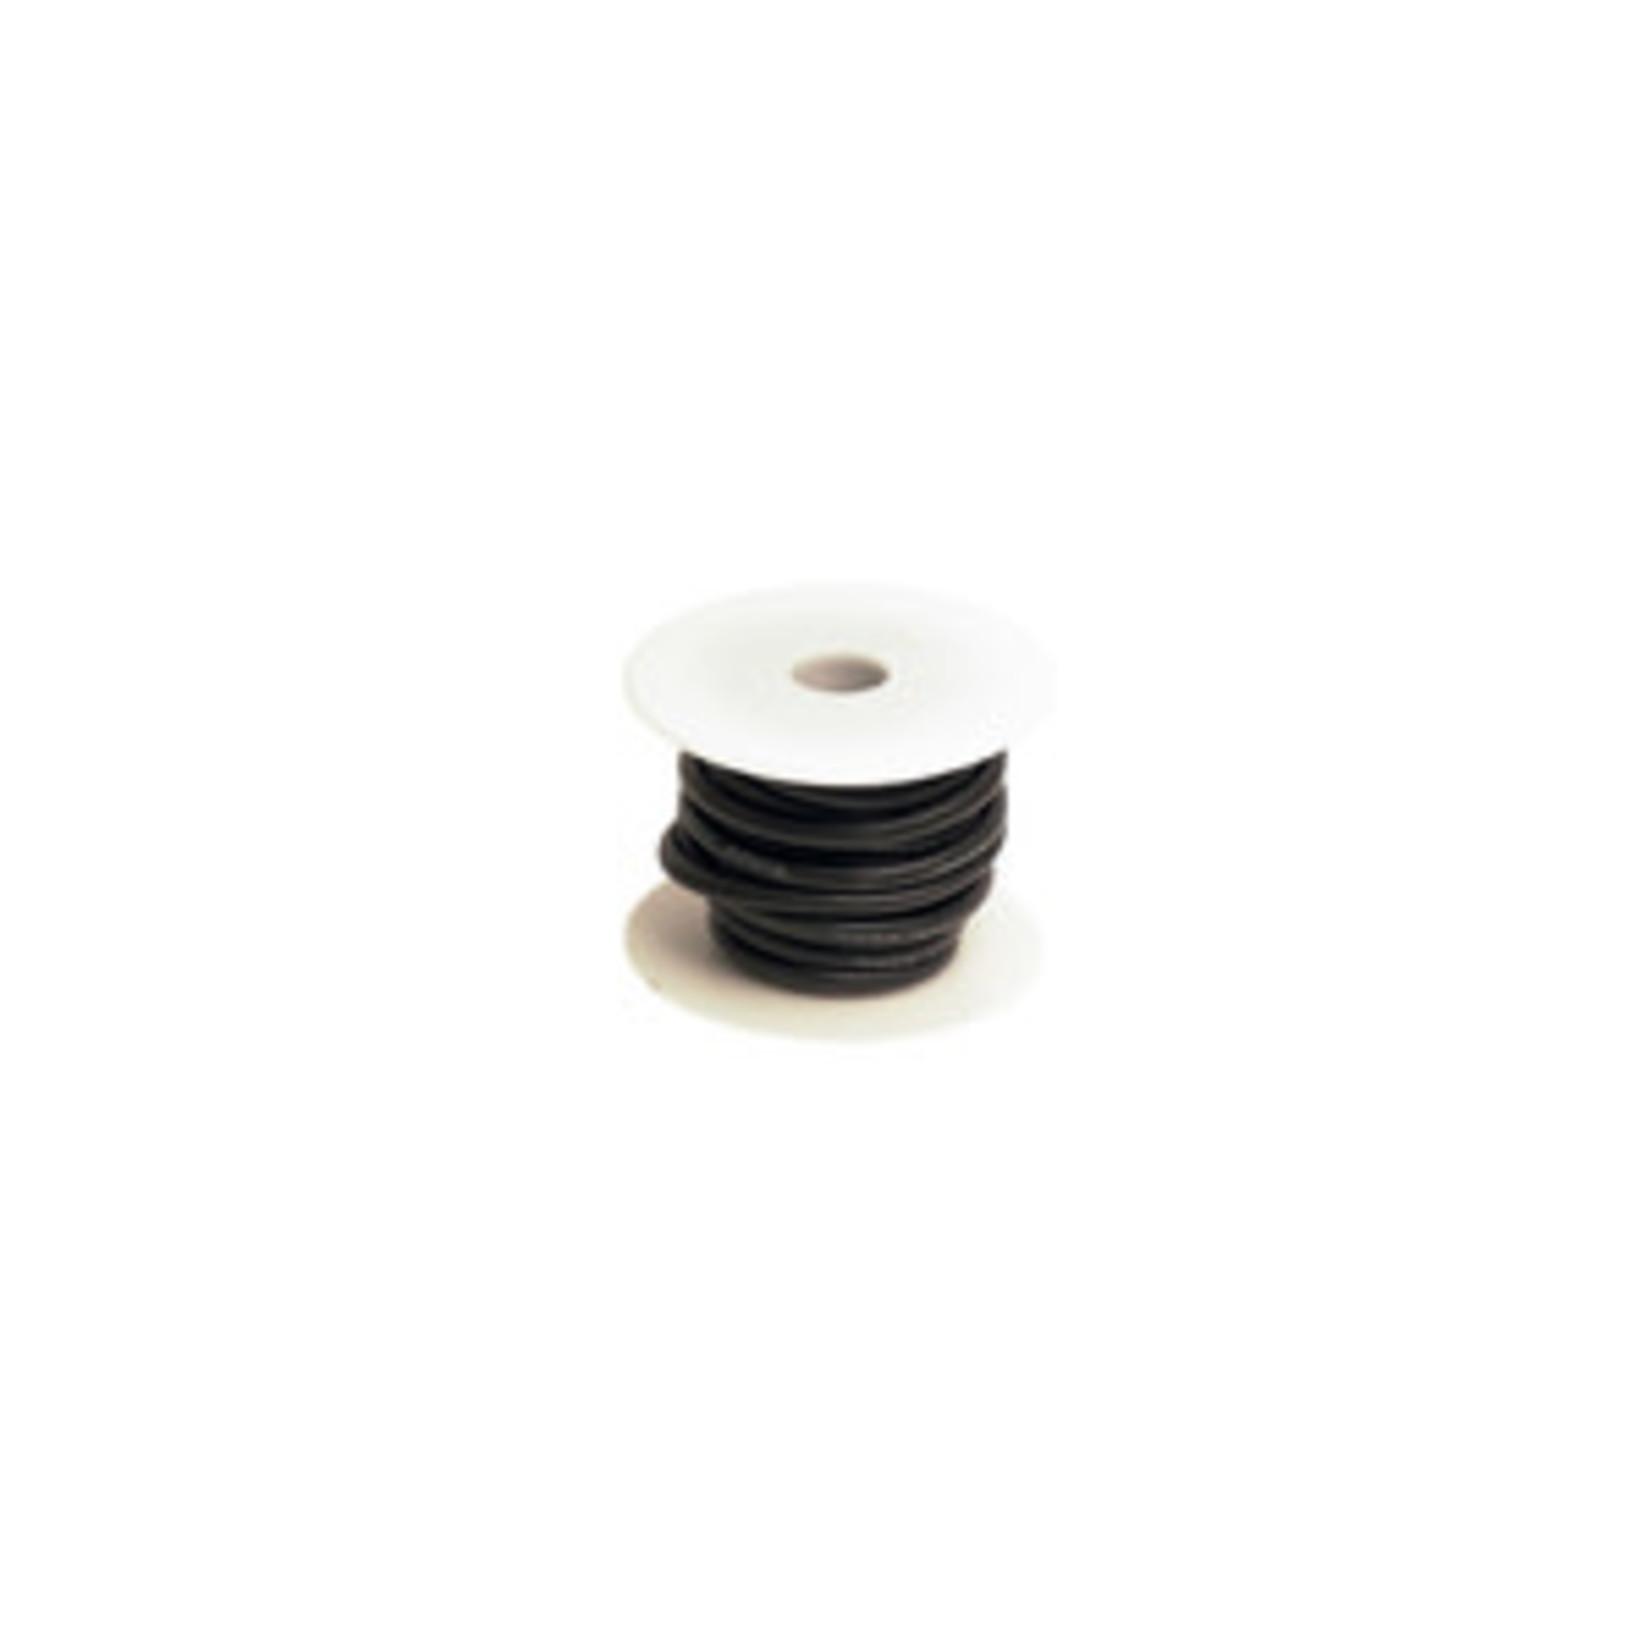 Racers Edge 10 Gauge Silicone Ultra-Flex Wire; 1 Feet (Black)